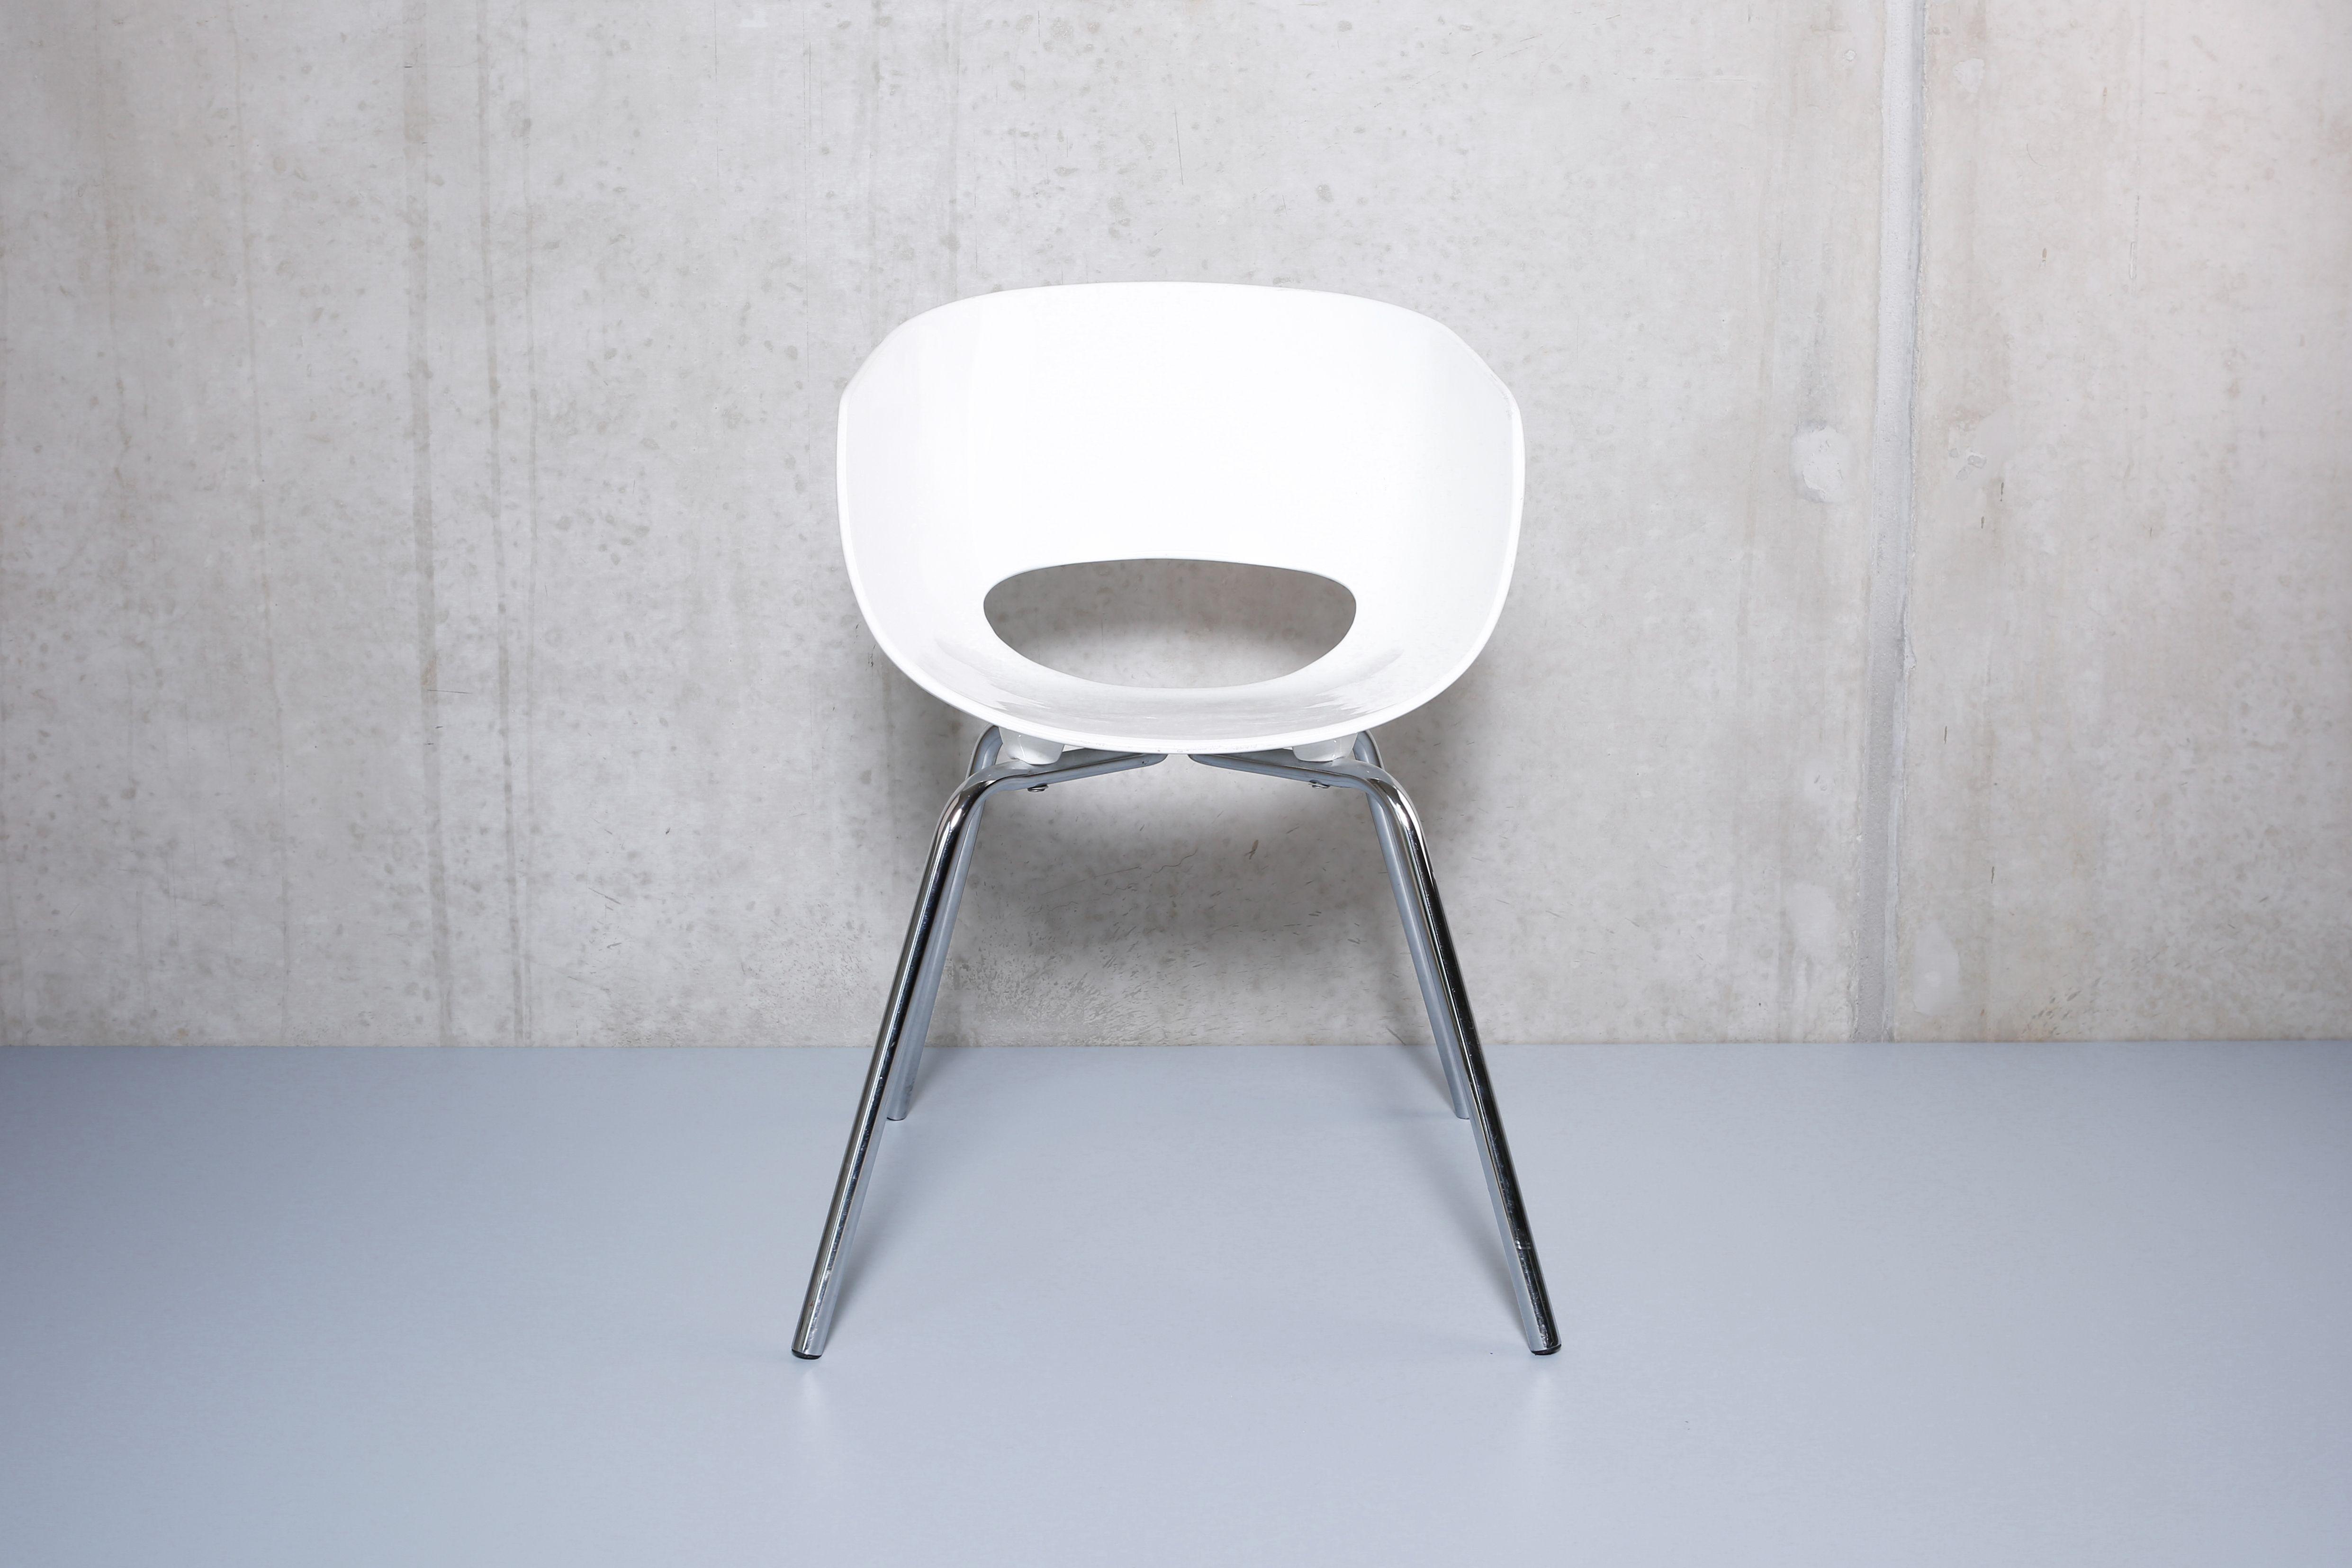 Kunststoff Chrom Stuhl Stuhle Stuhl Design Tisch Und Stuhle